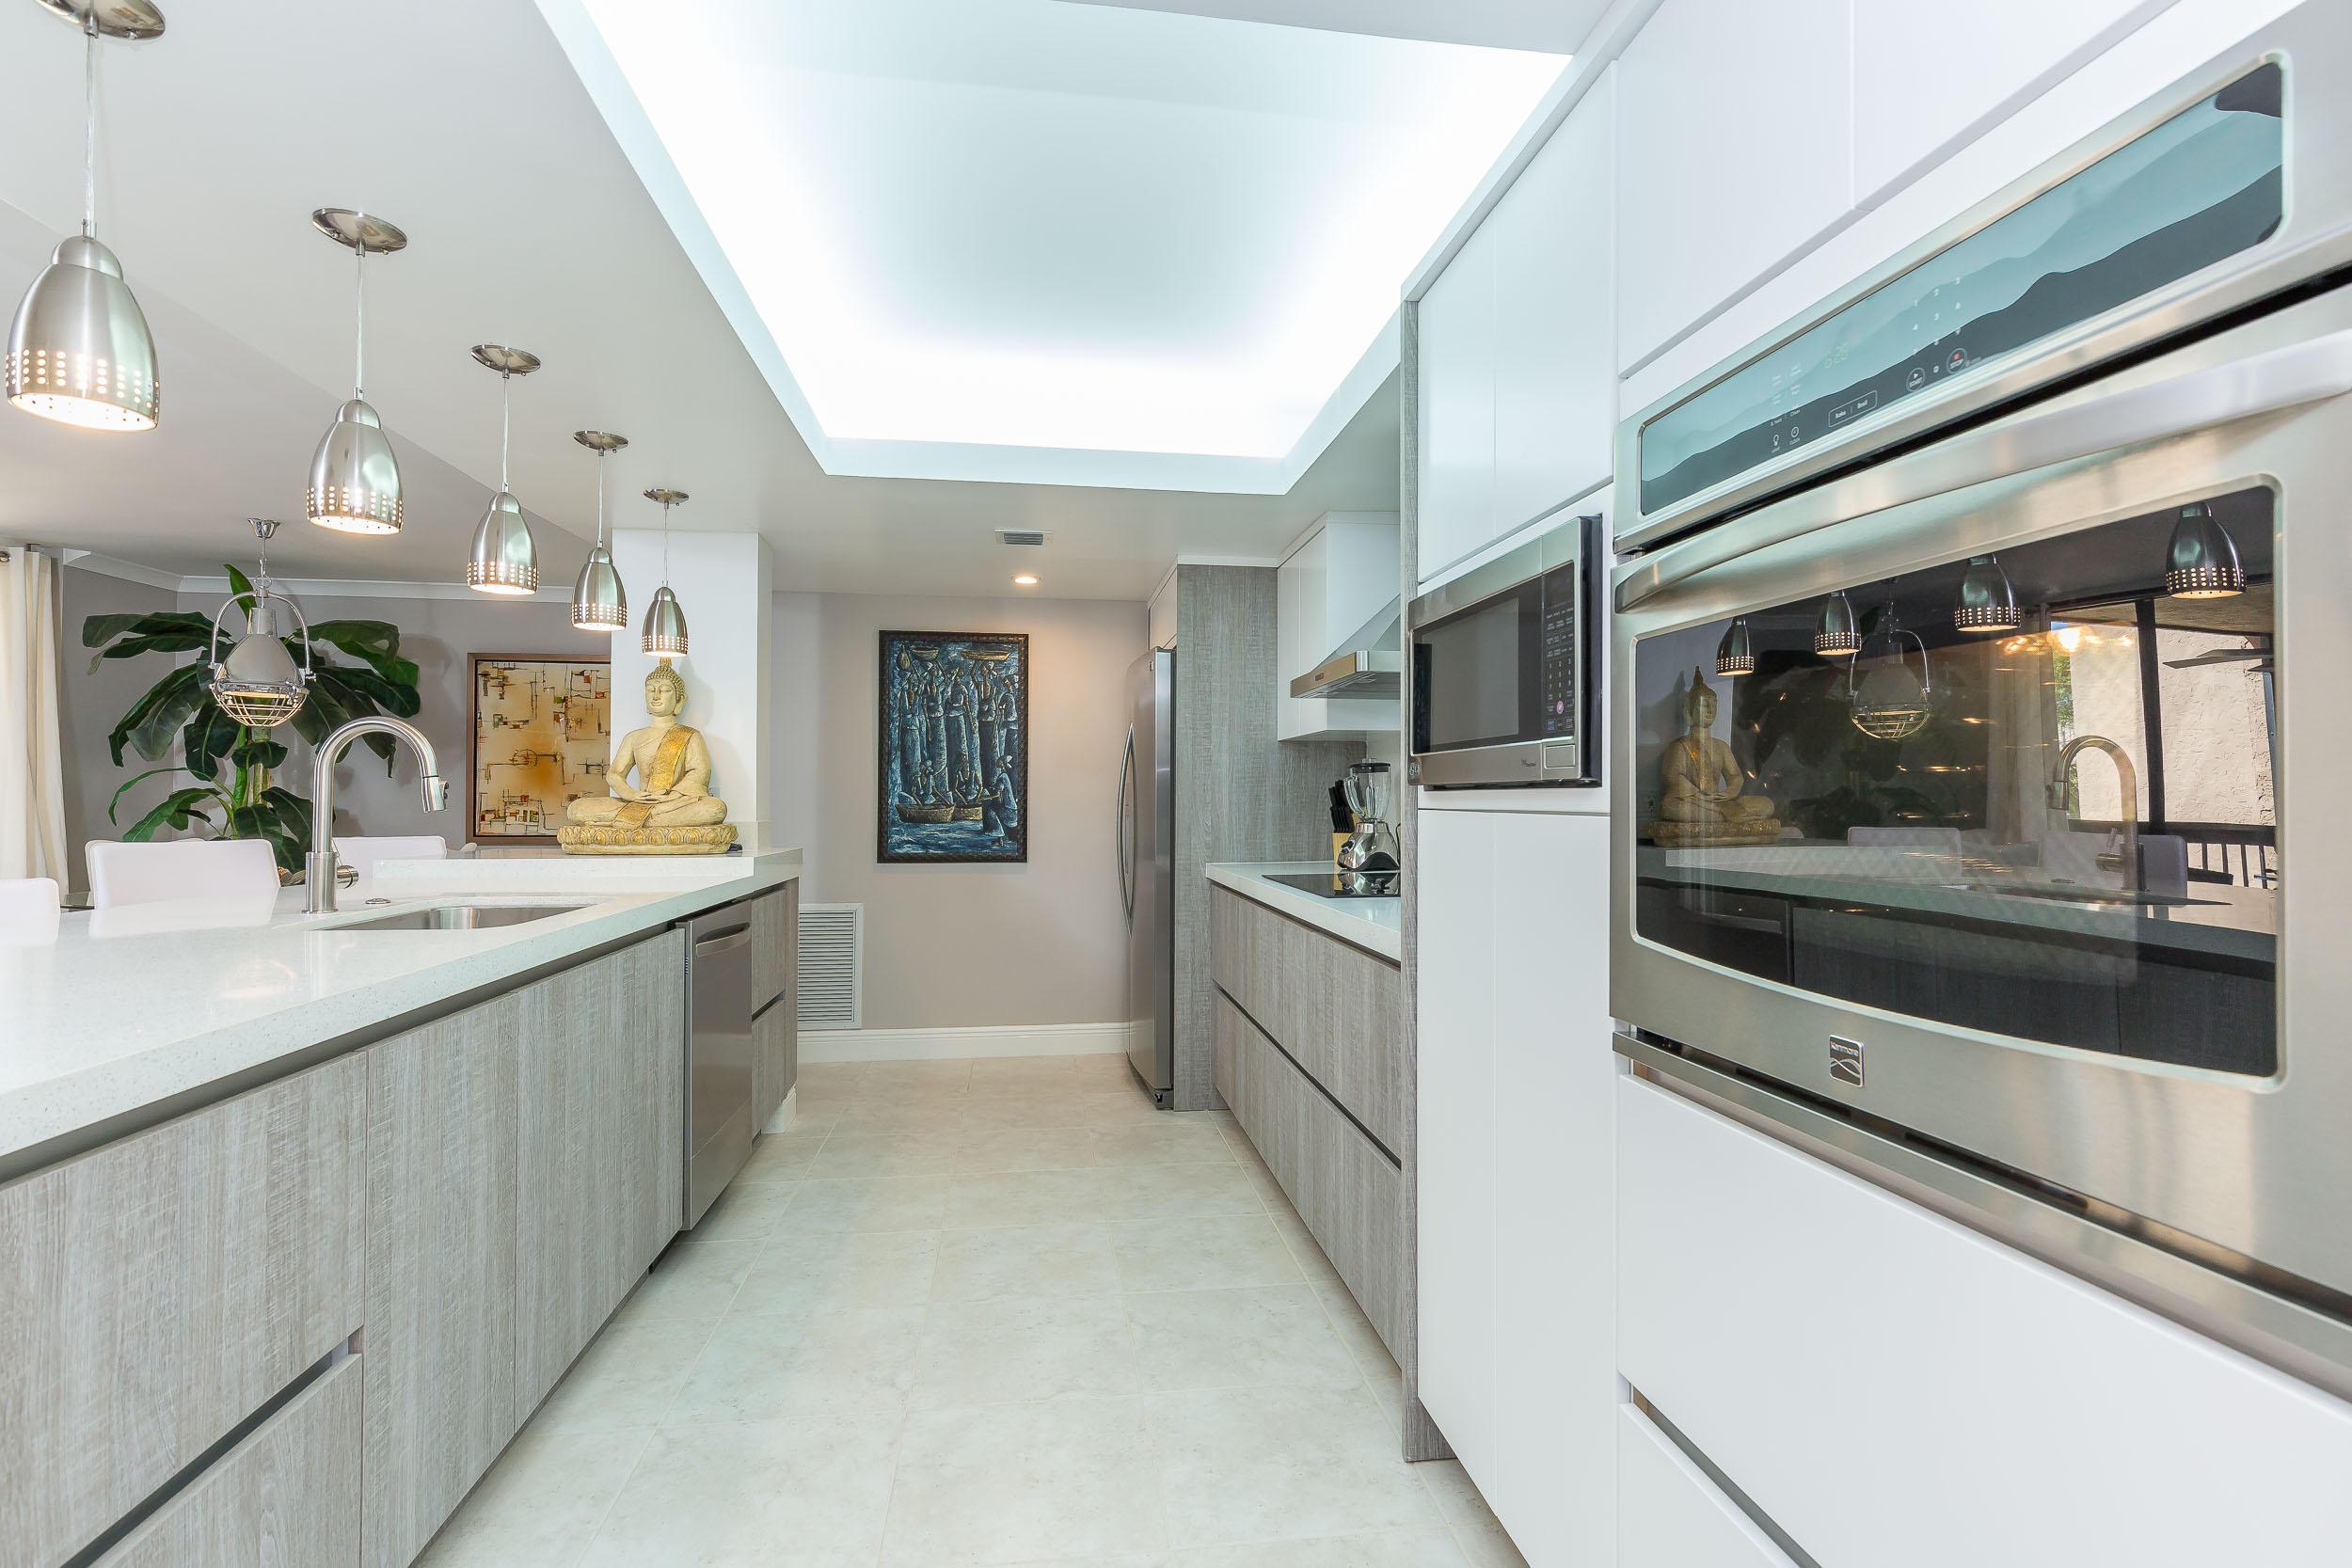 2455 Lindell Boulevard, Delray Beach, Florida 33444, 2 Bedrooms Bedrooms, ,2 BathroomsBathrooms,Rental,For Rent,Lindell,RX-10594352